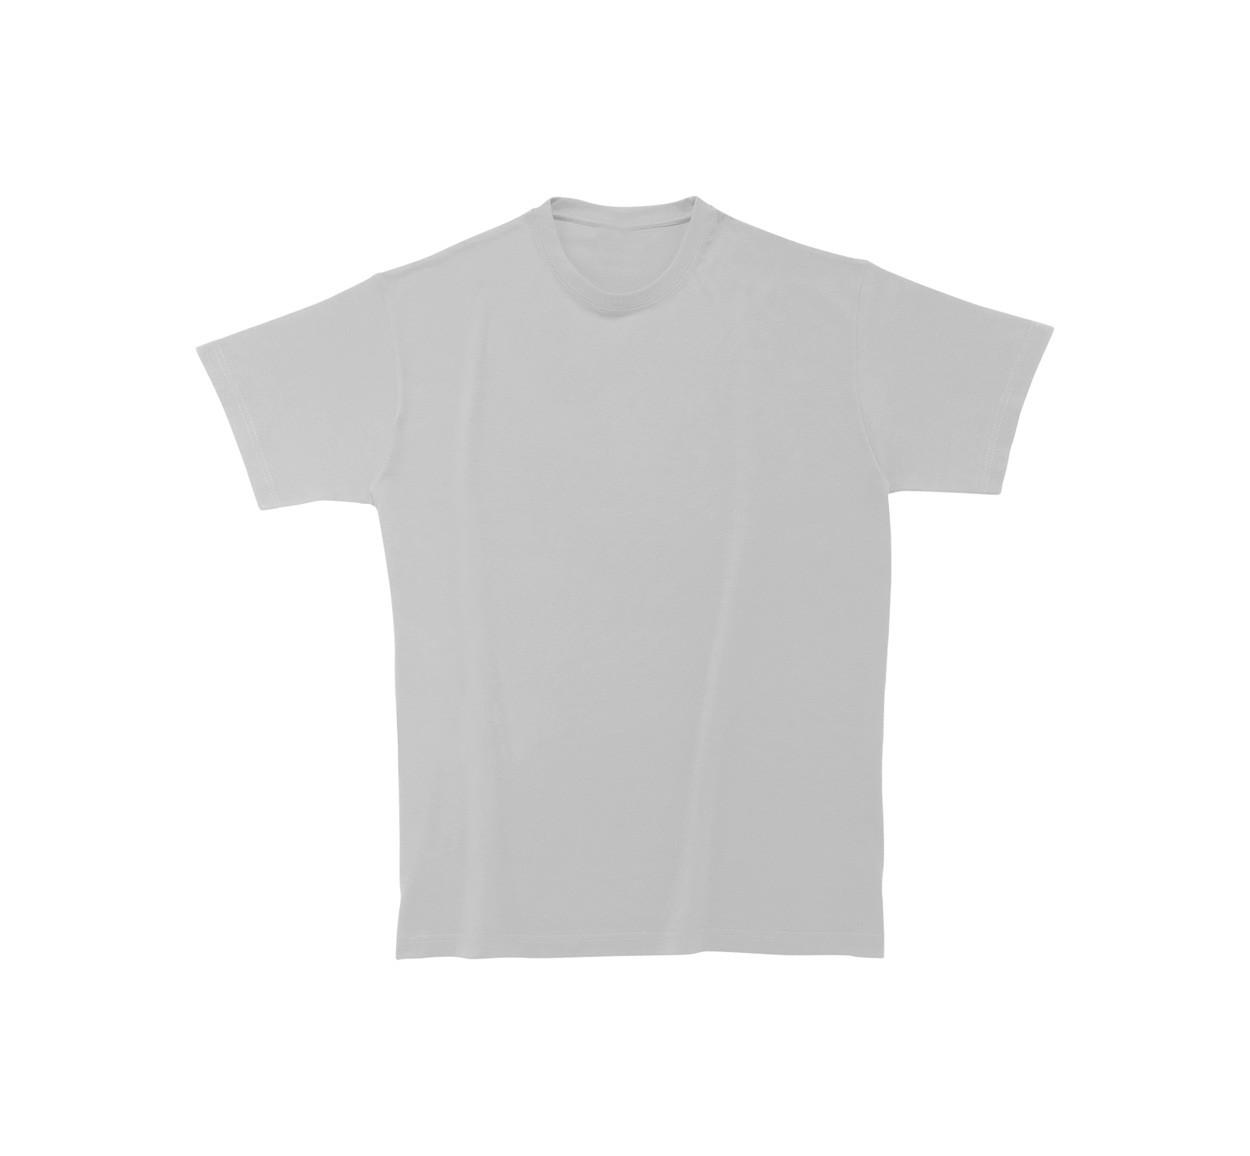 T-Shirt Softstyle Man - White / S